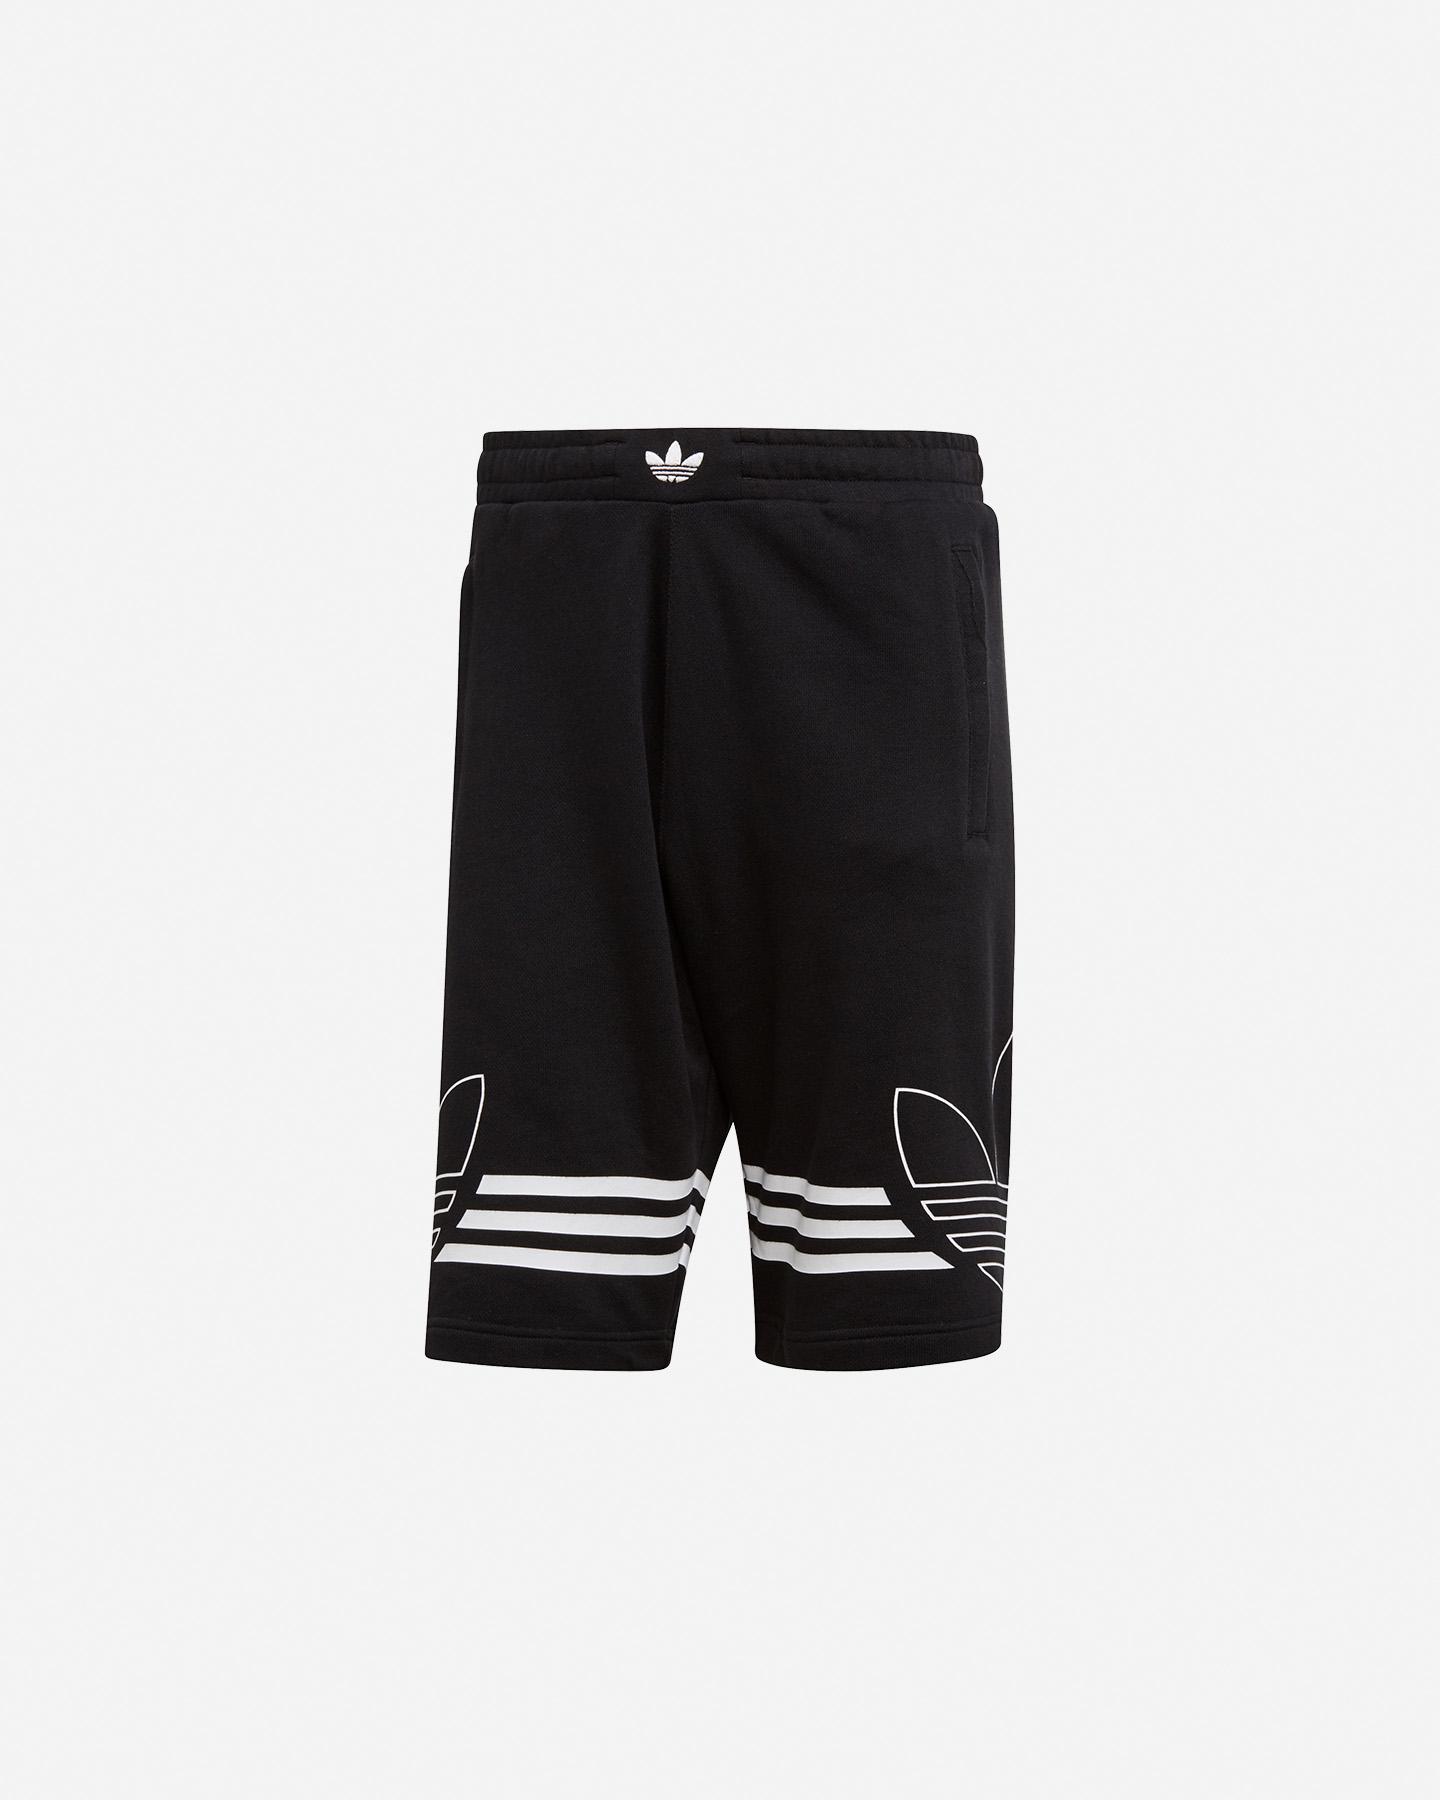 Pantaloncini da Bambino adidas Outlines